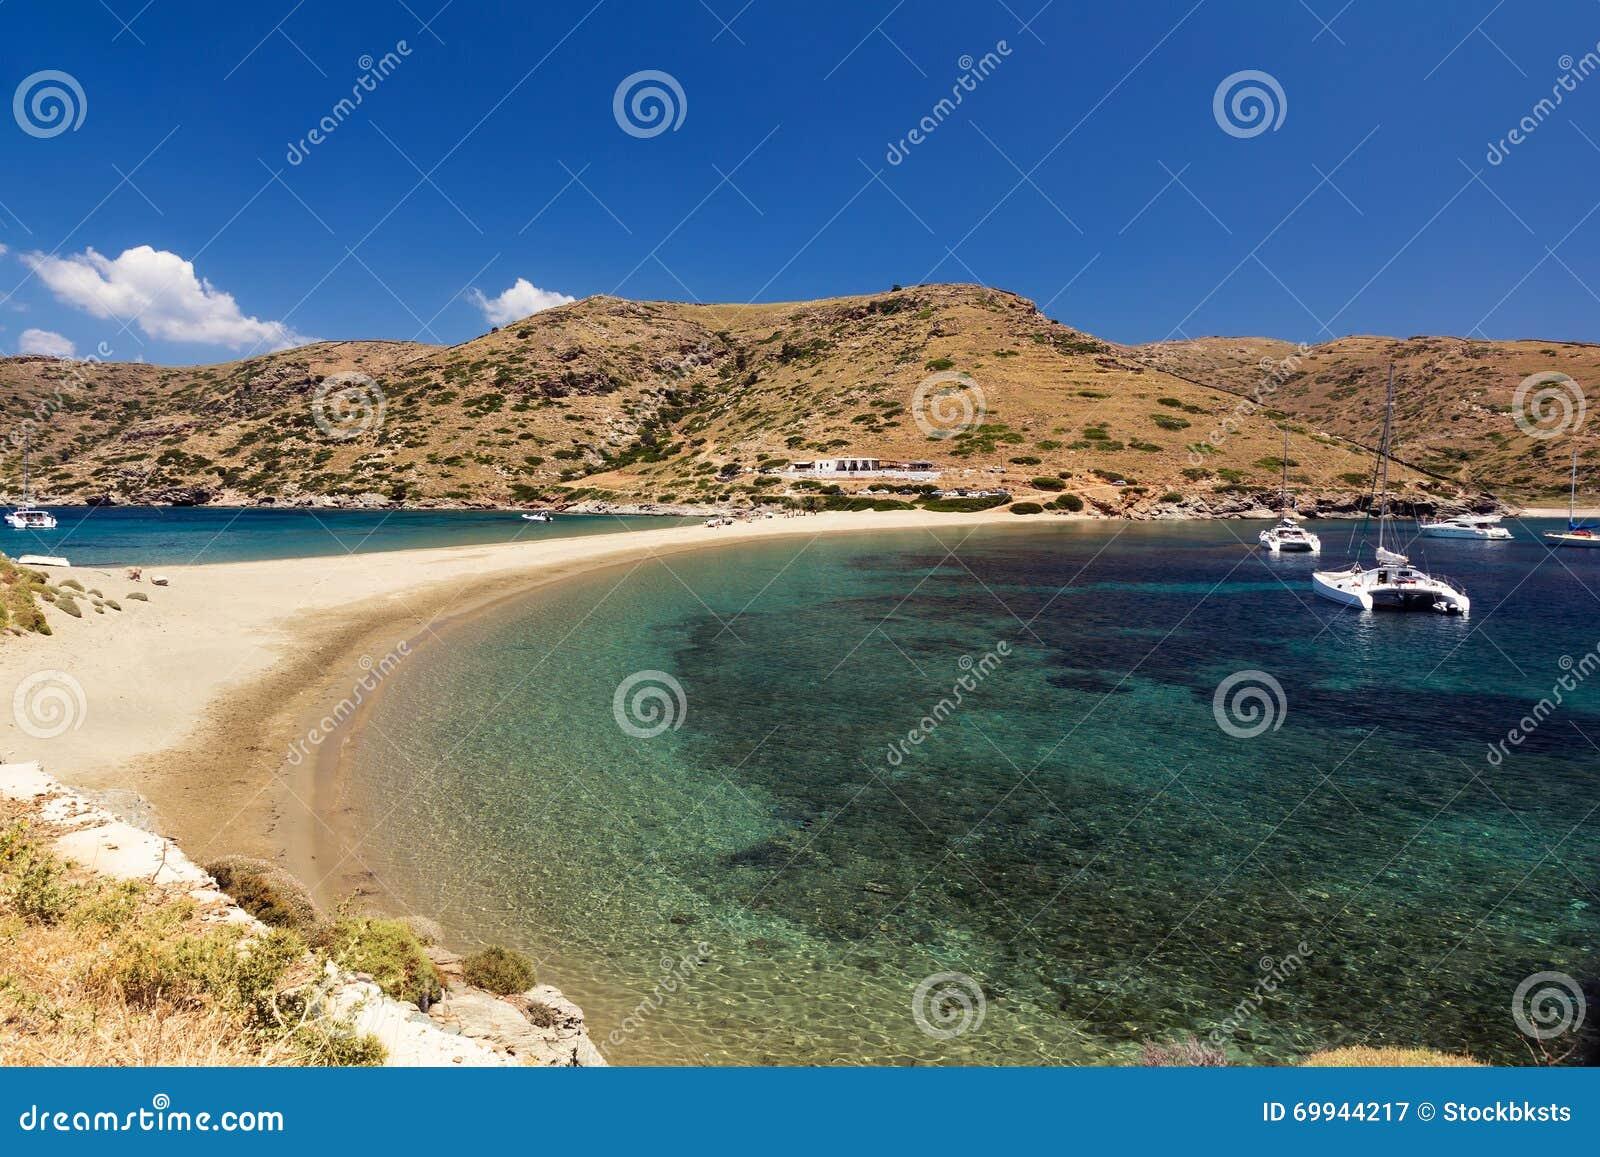 Kolona Beach Kythnos Stock Photo - Image: 69944217